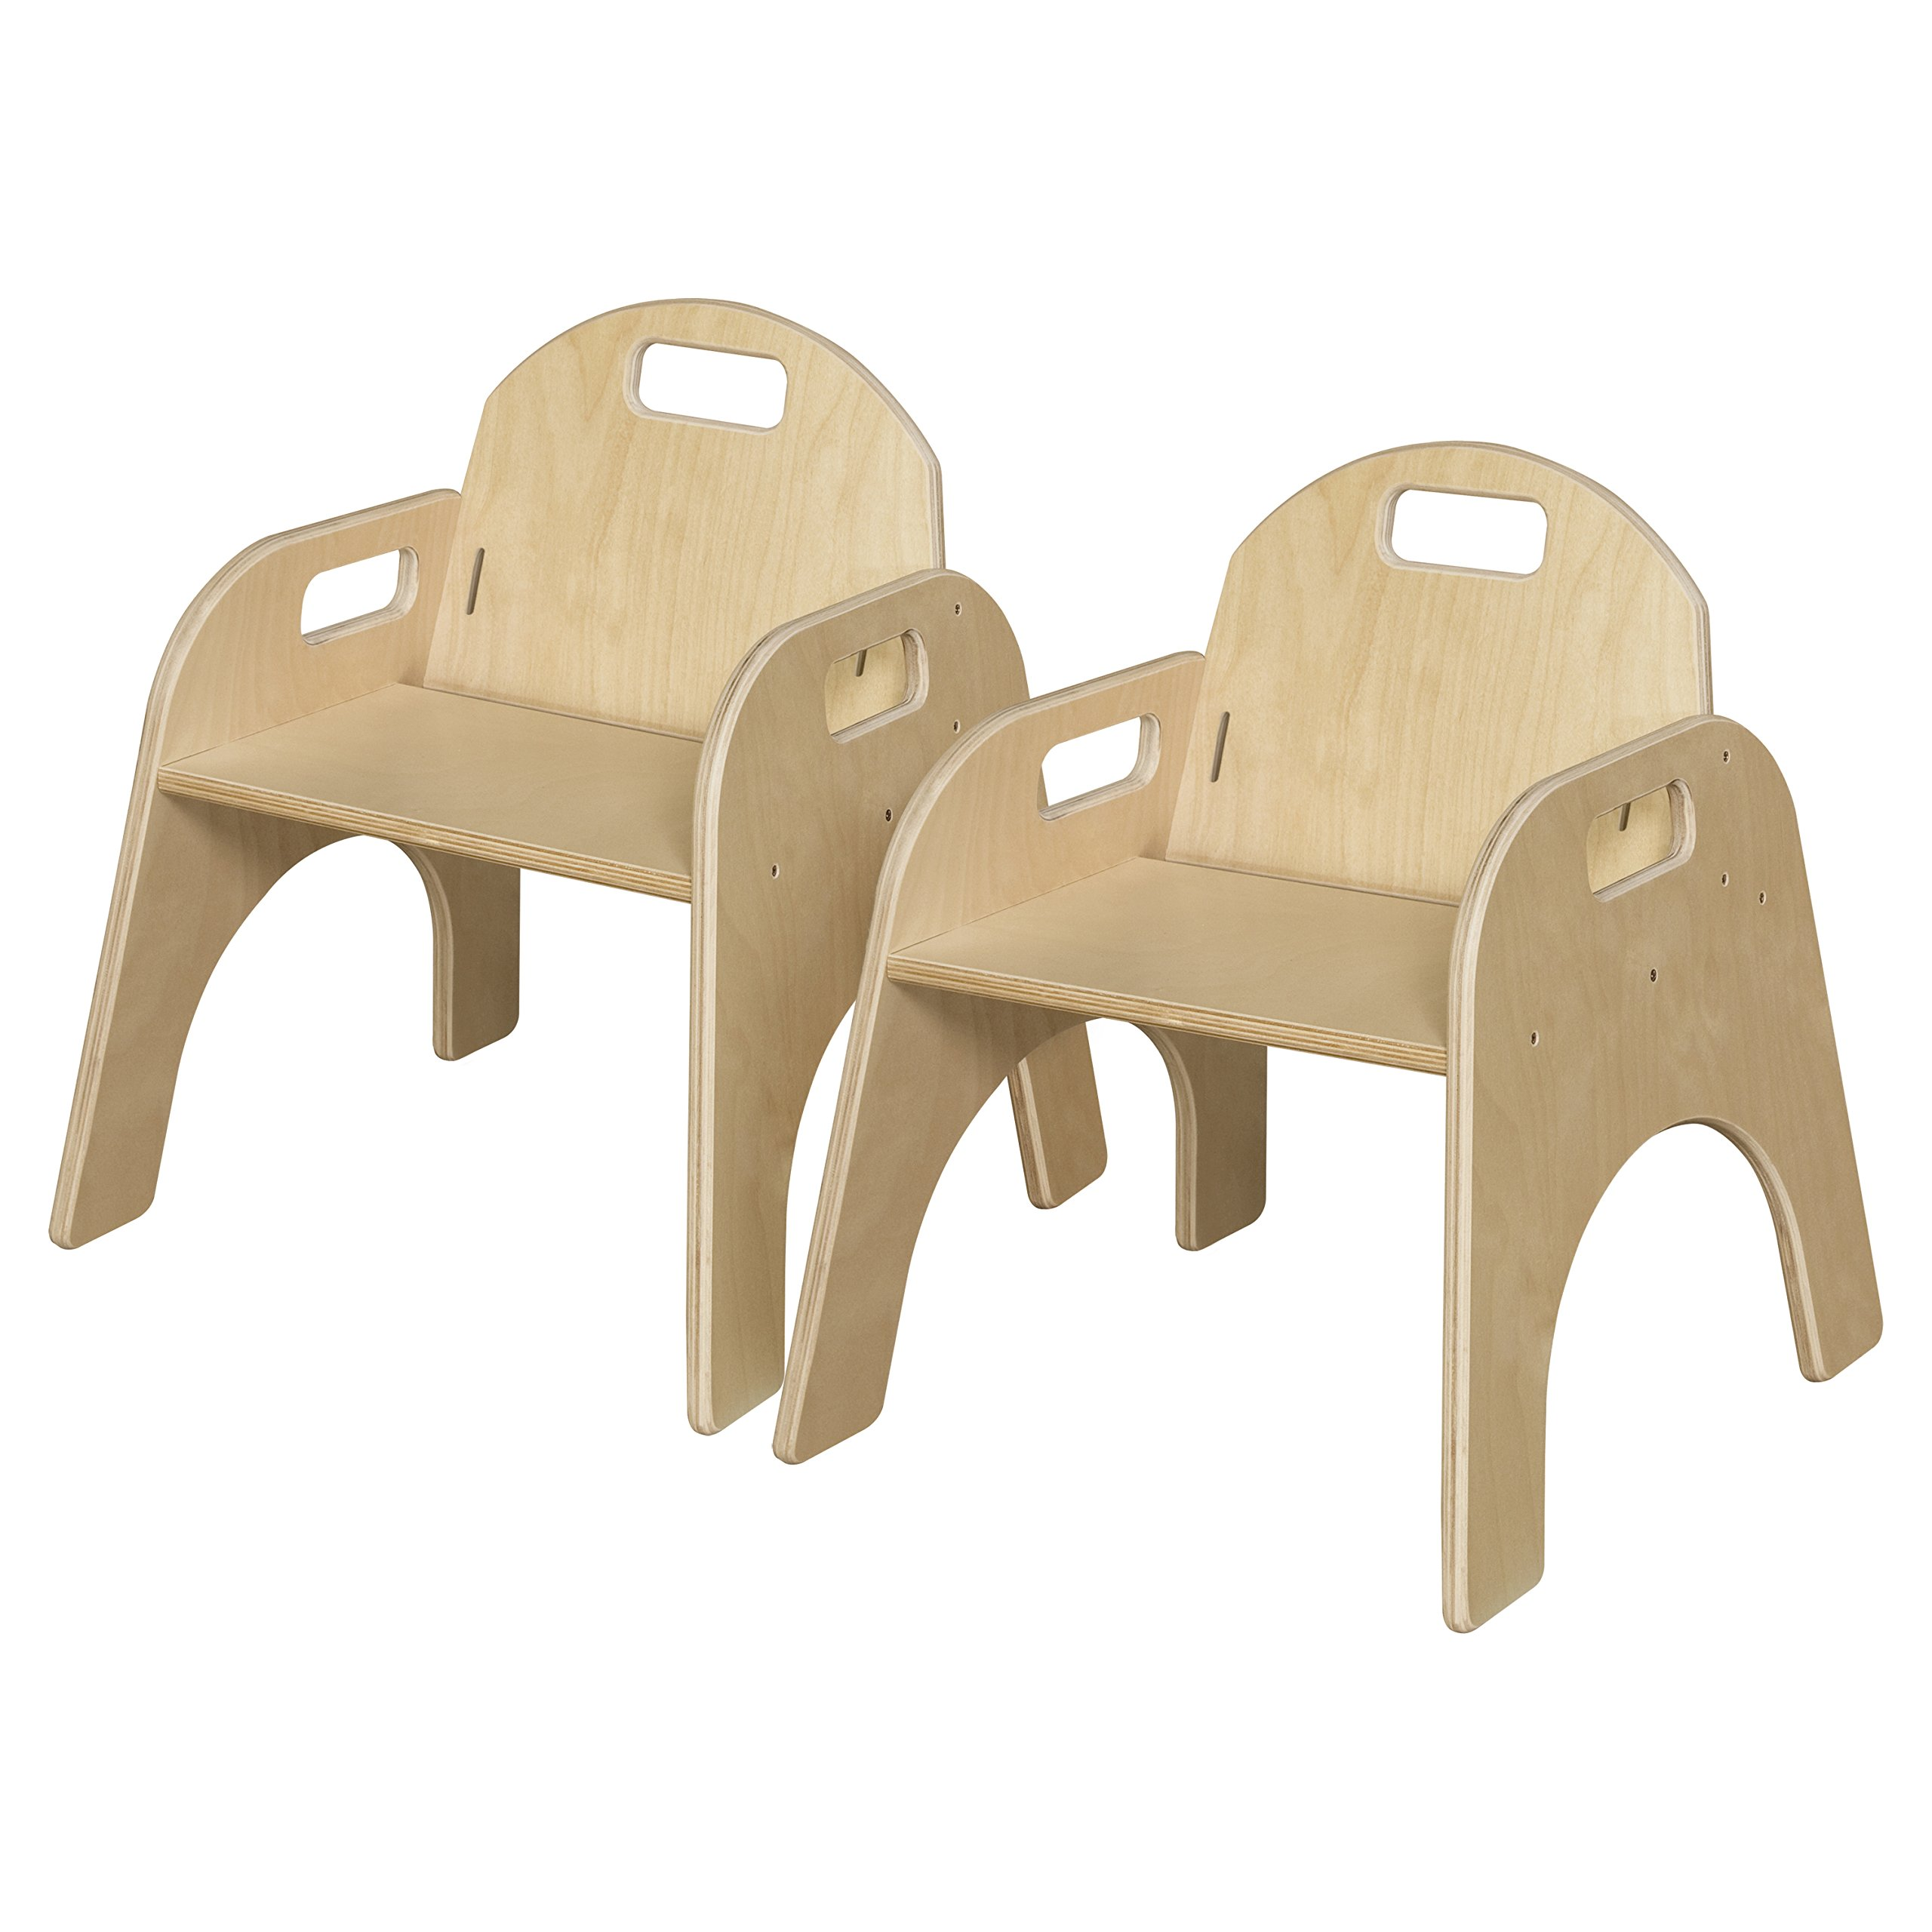 Wood Designs Stackable Woodie Kids Chair, 11'' High Seat, Set of 2